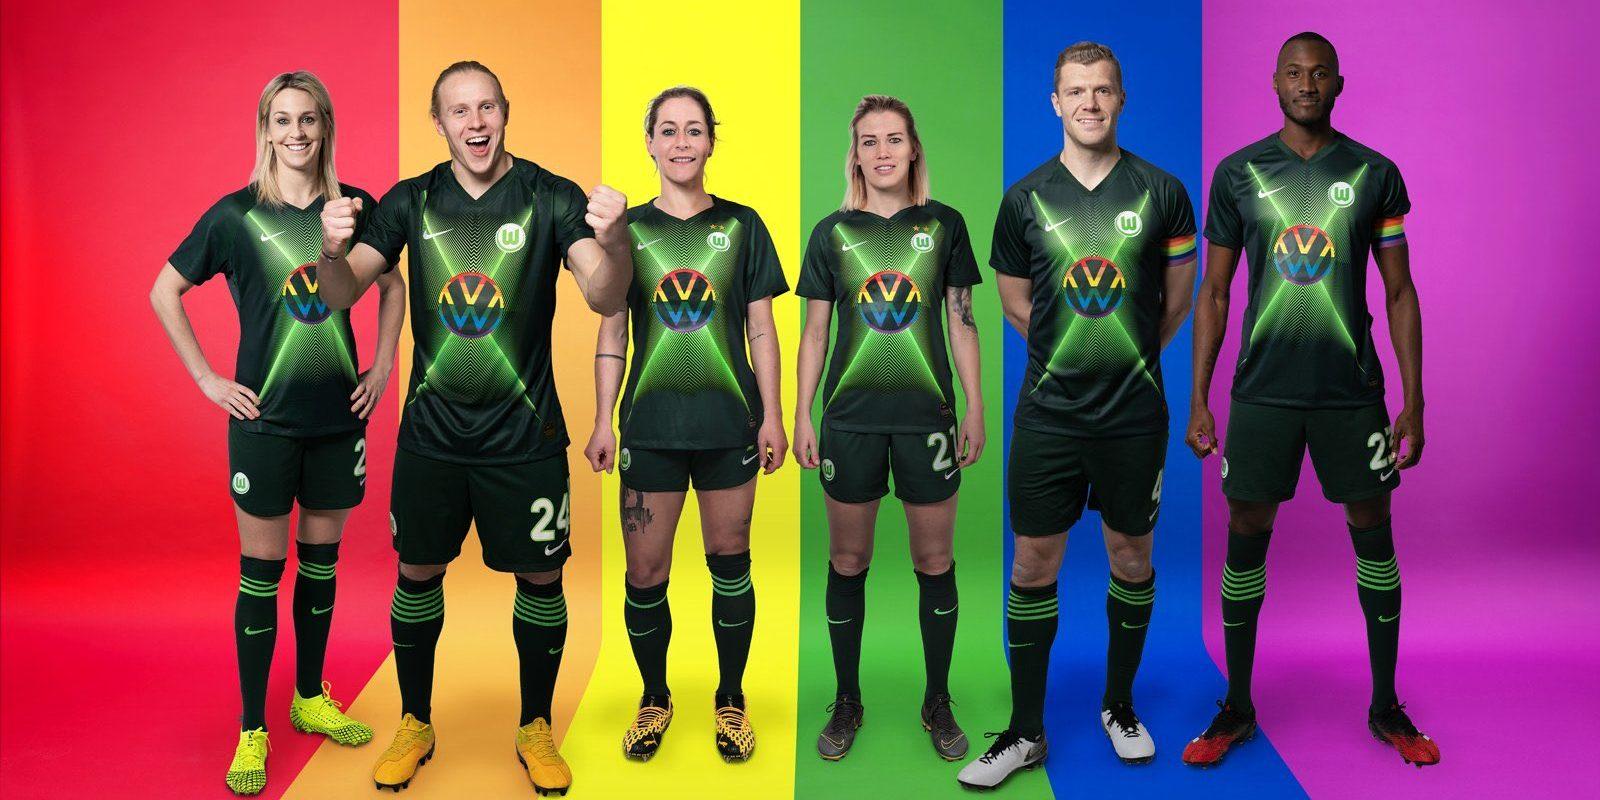 Wolfsburg utilizará camisa da diversidade na Bundesliga